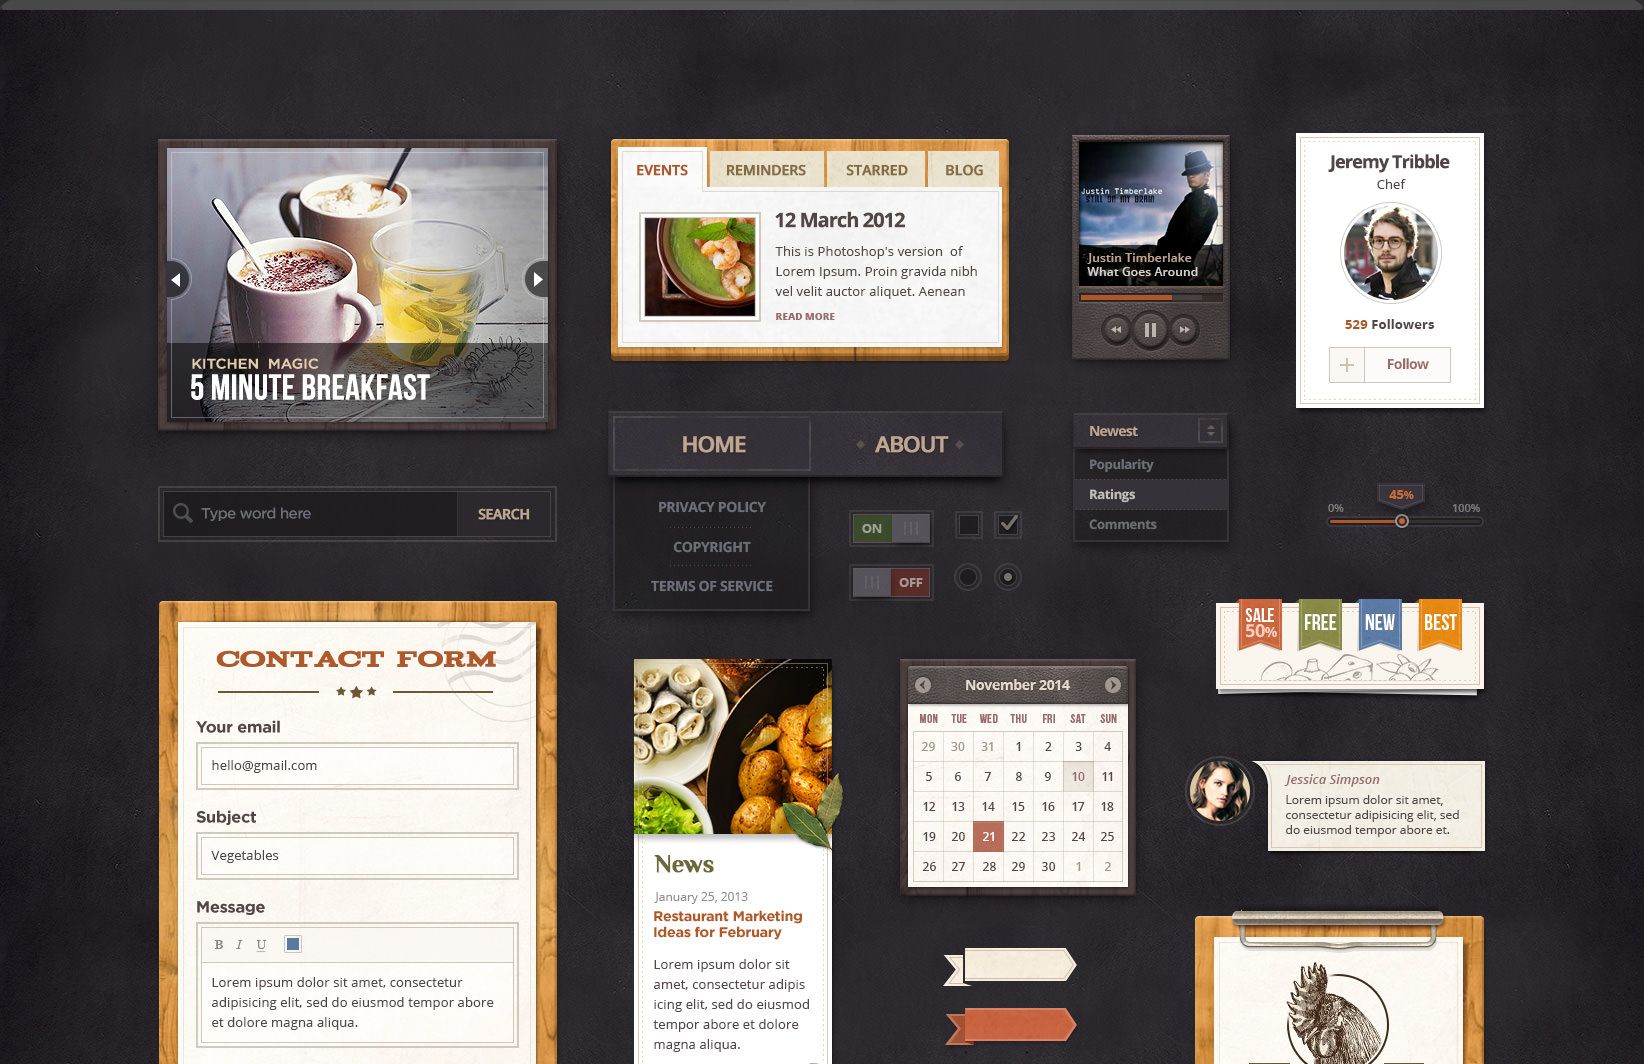 Design, Photo & Graphics Software, Graphic Design Software Screenshot